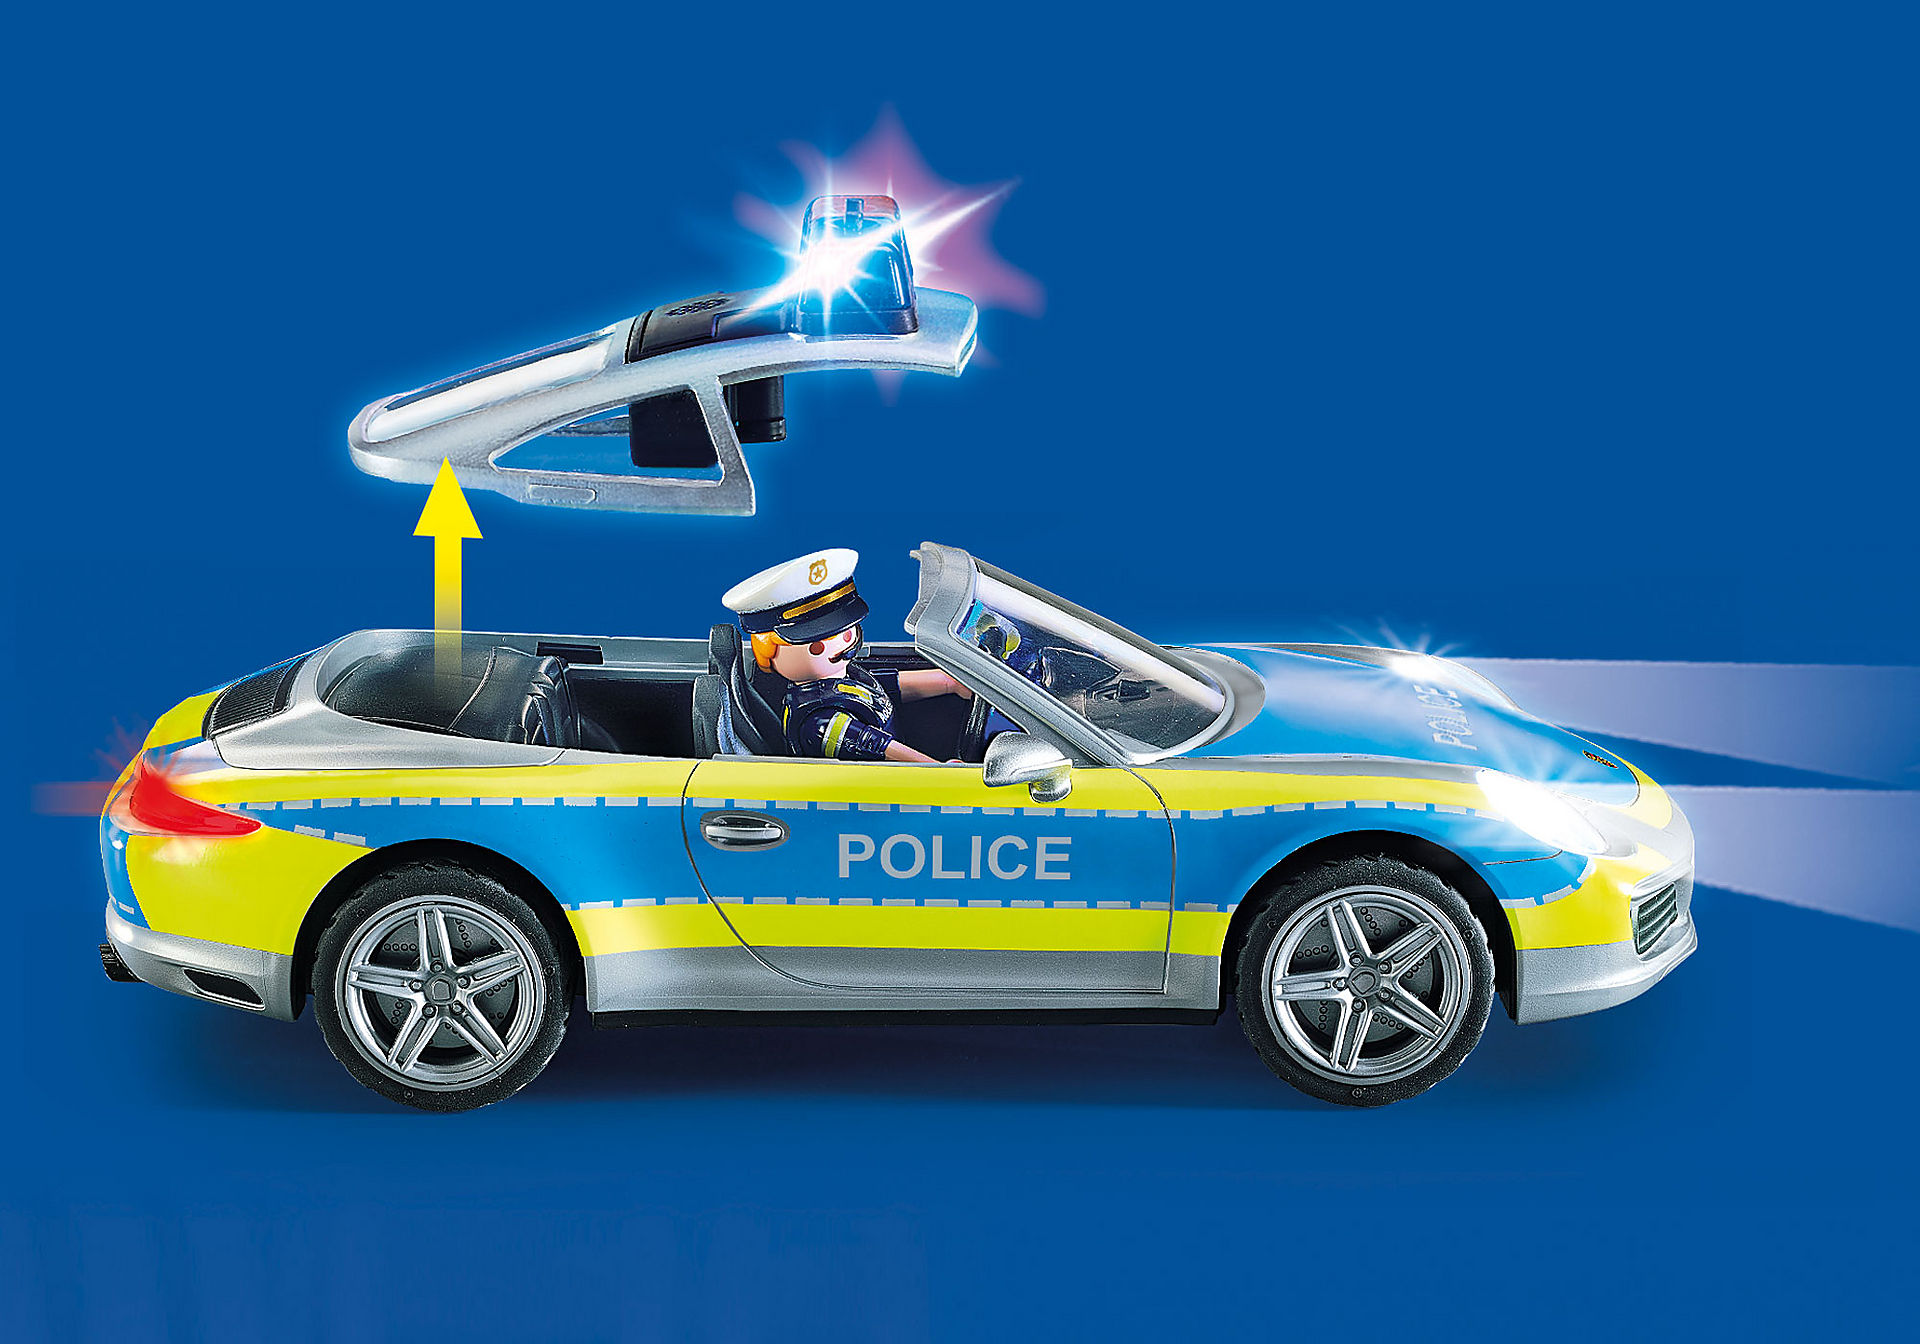 70066 Porsche 911 Carrera 4S Policja zoom image4